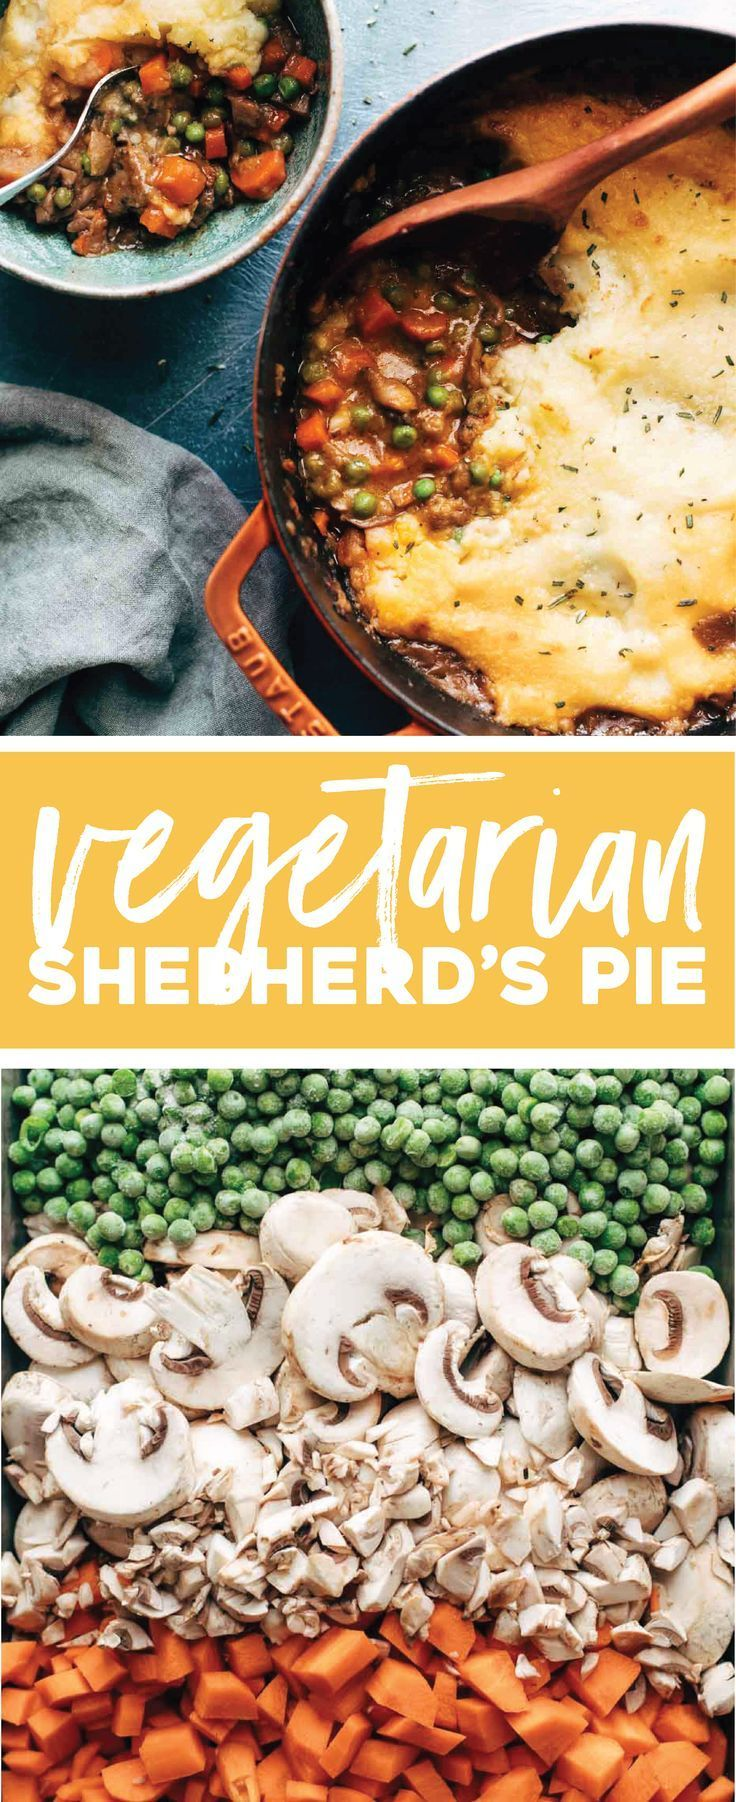 Vegetarian Shepherd's Pie ♡ saucy mushrooms, carrots, and peas topped with creamy mashed potatoes. Real food meets comfort food! #meatless #vegetarian #vegan #mushroom #shepherdspie #cleaneating #casserole #plantbased | pinchofyum.com